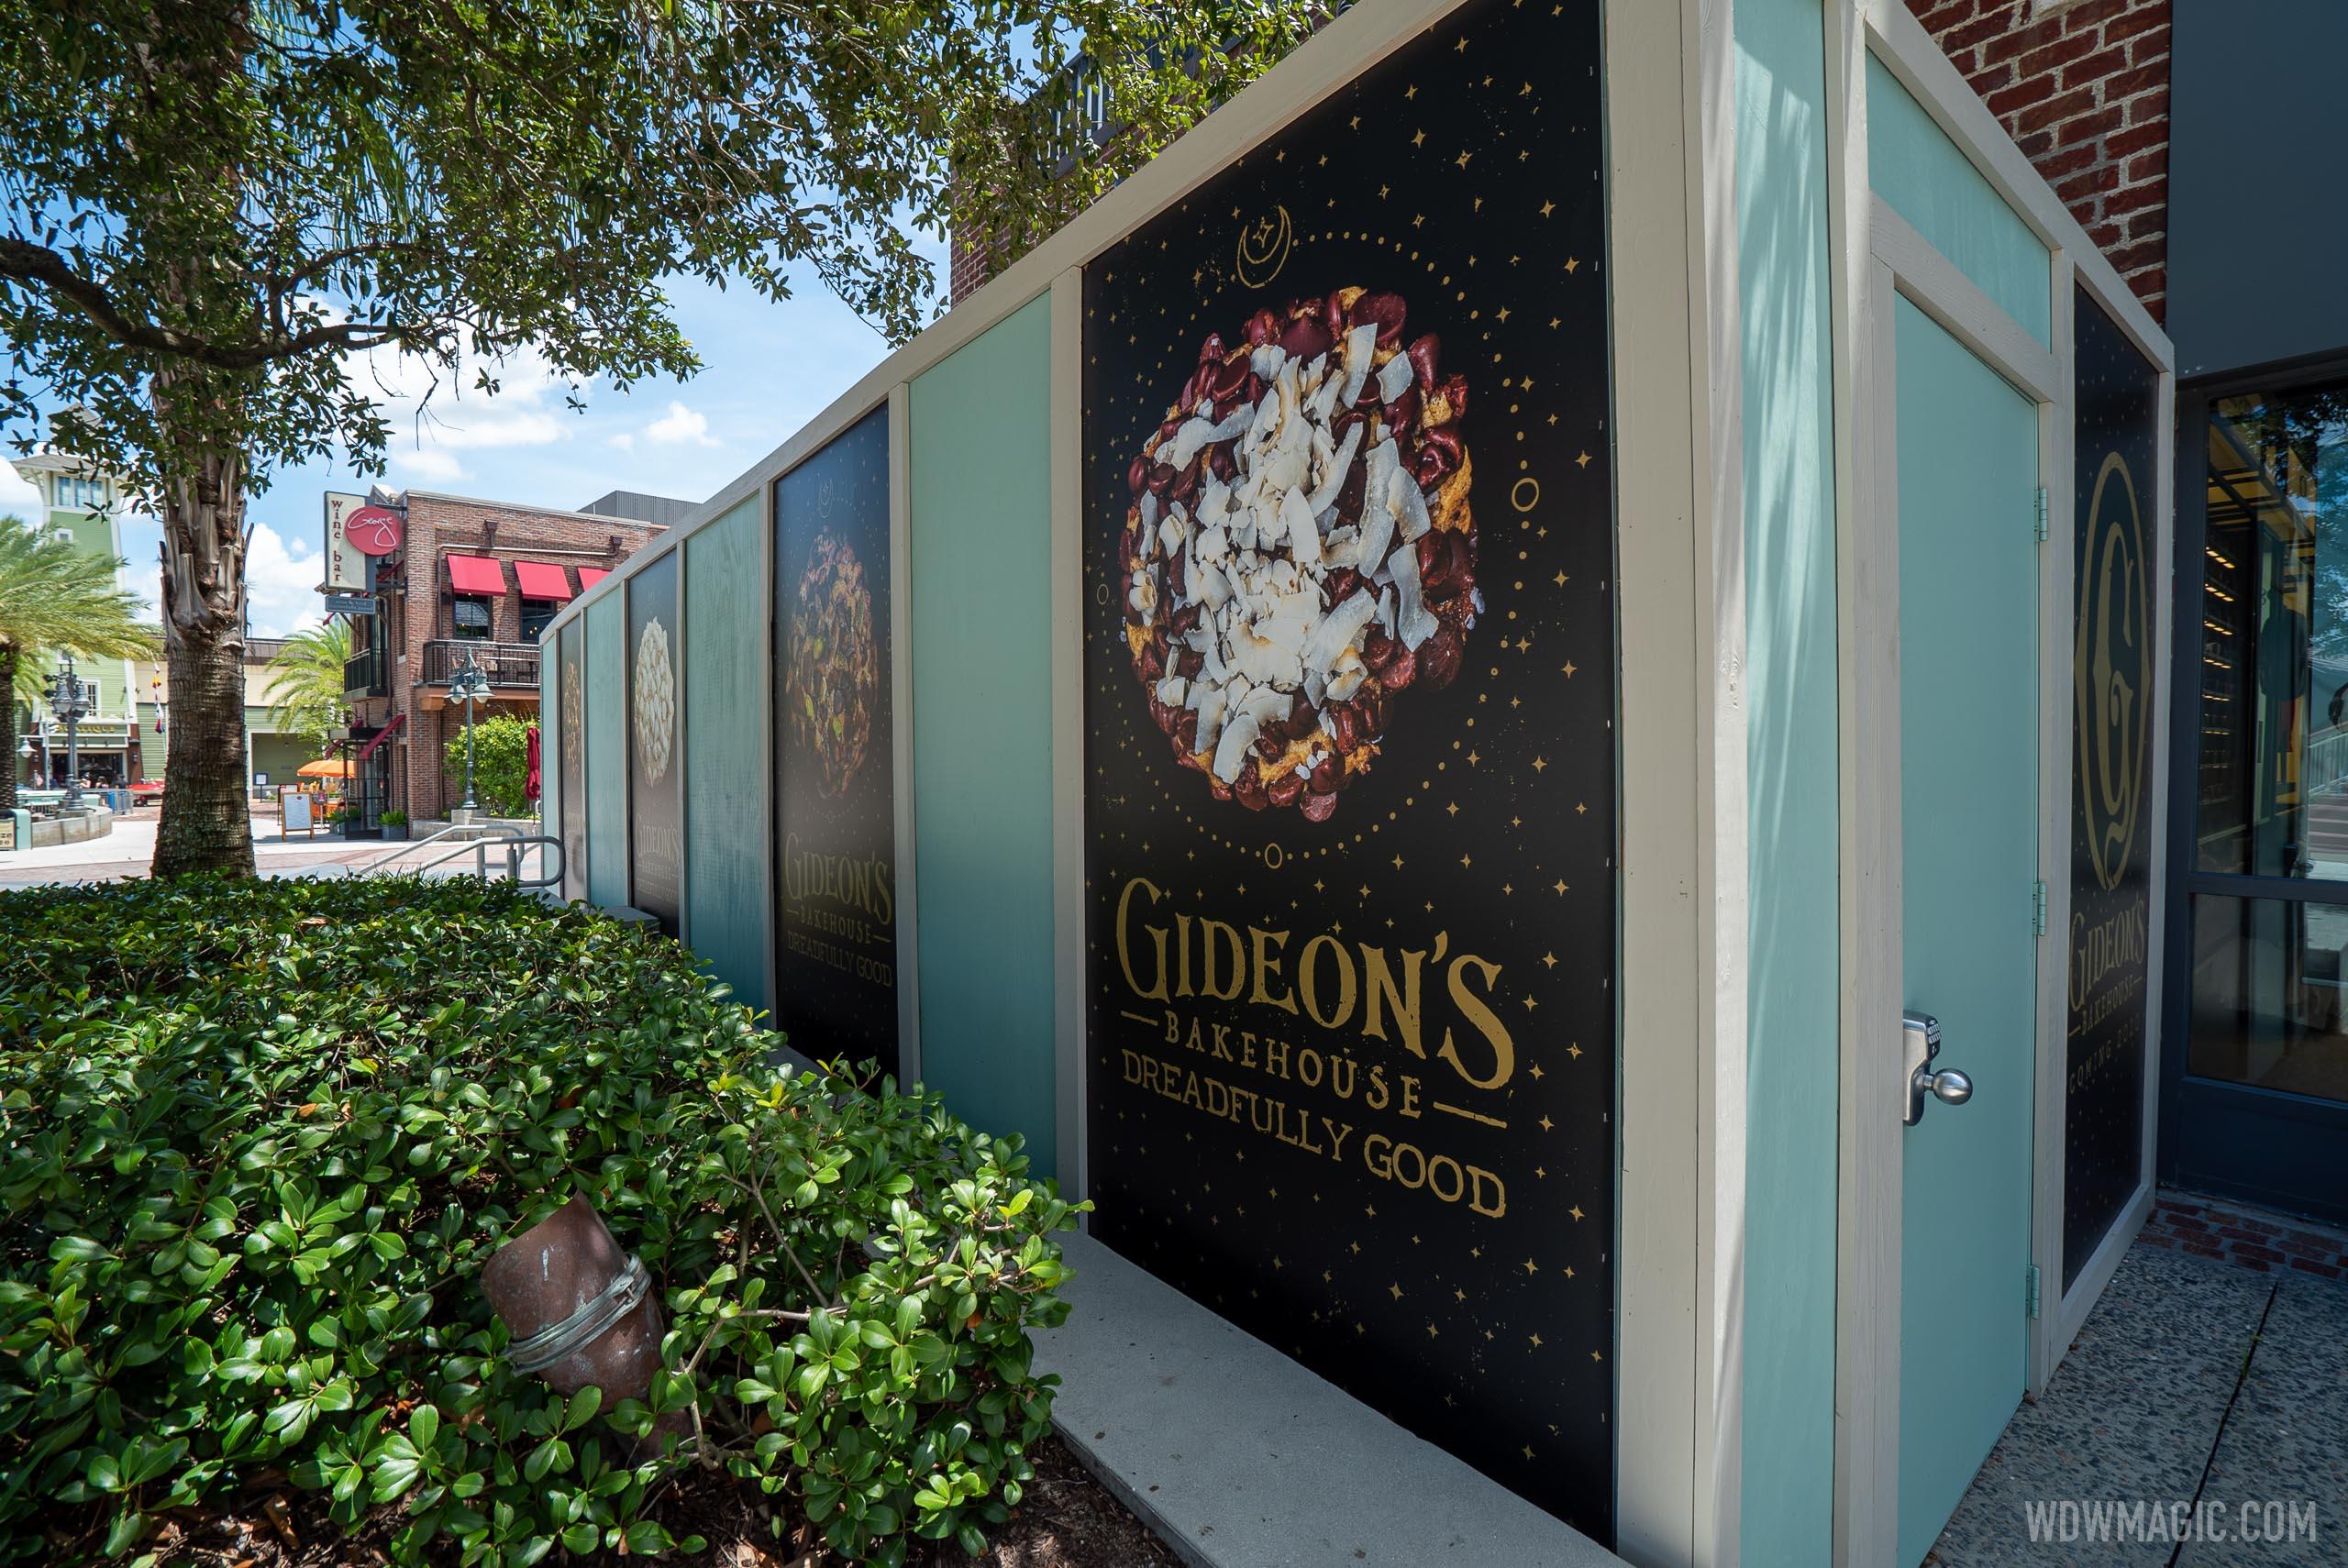 Gideon's Bakehouse construction - August 11 2020